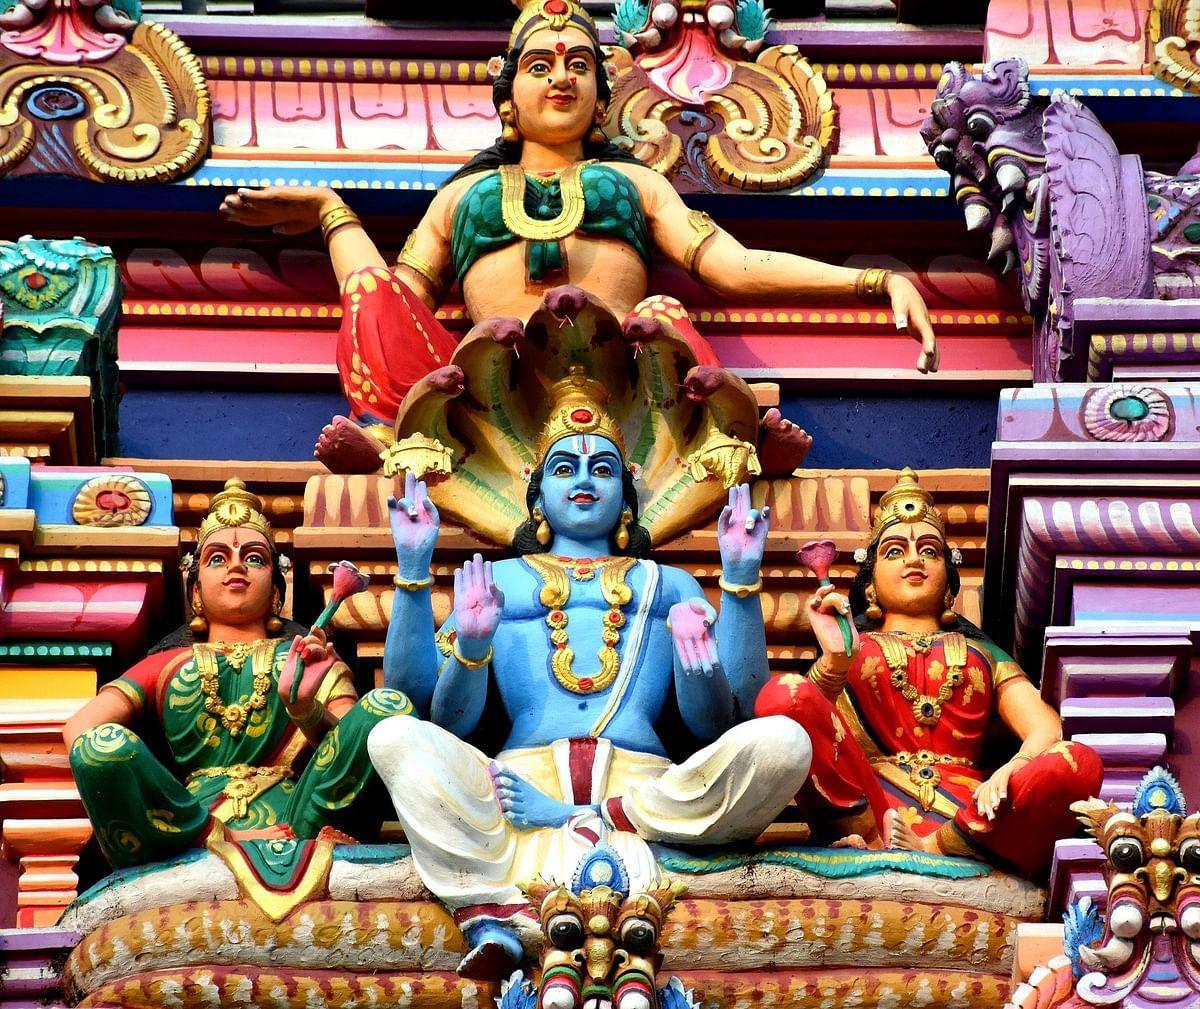 भगवान विष्णु- Lord Vishnu in Hindi